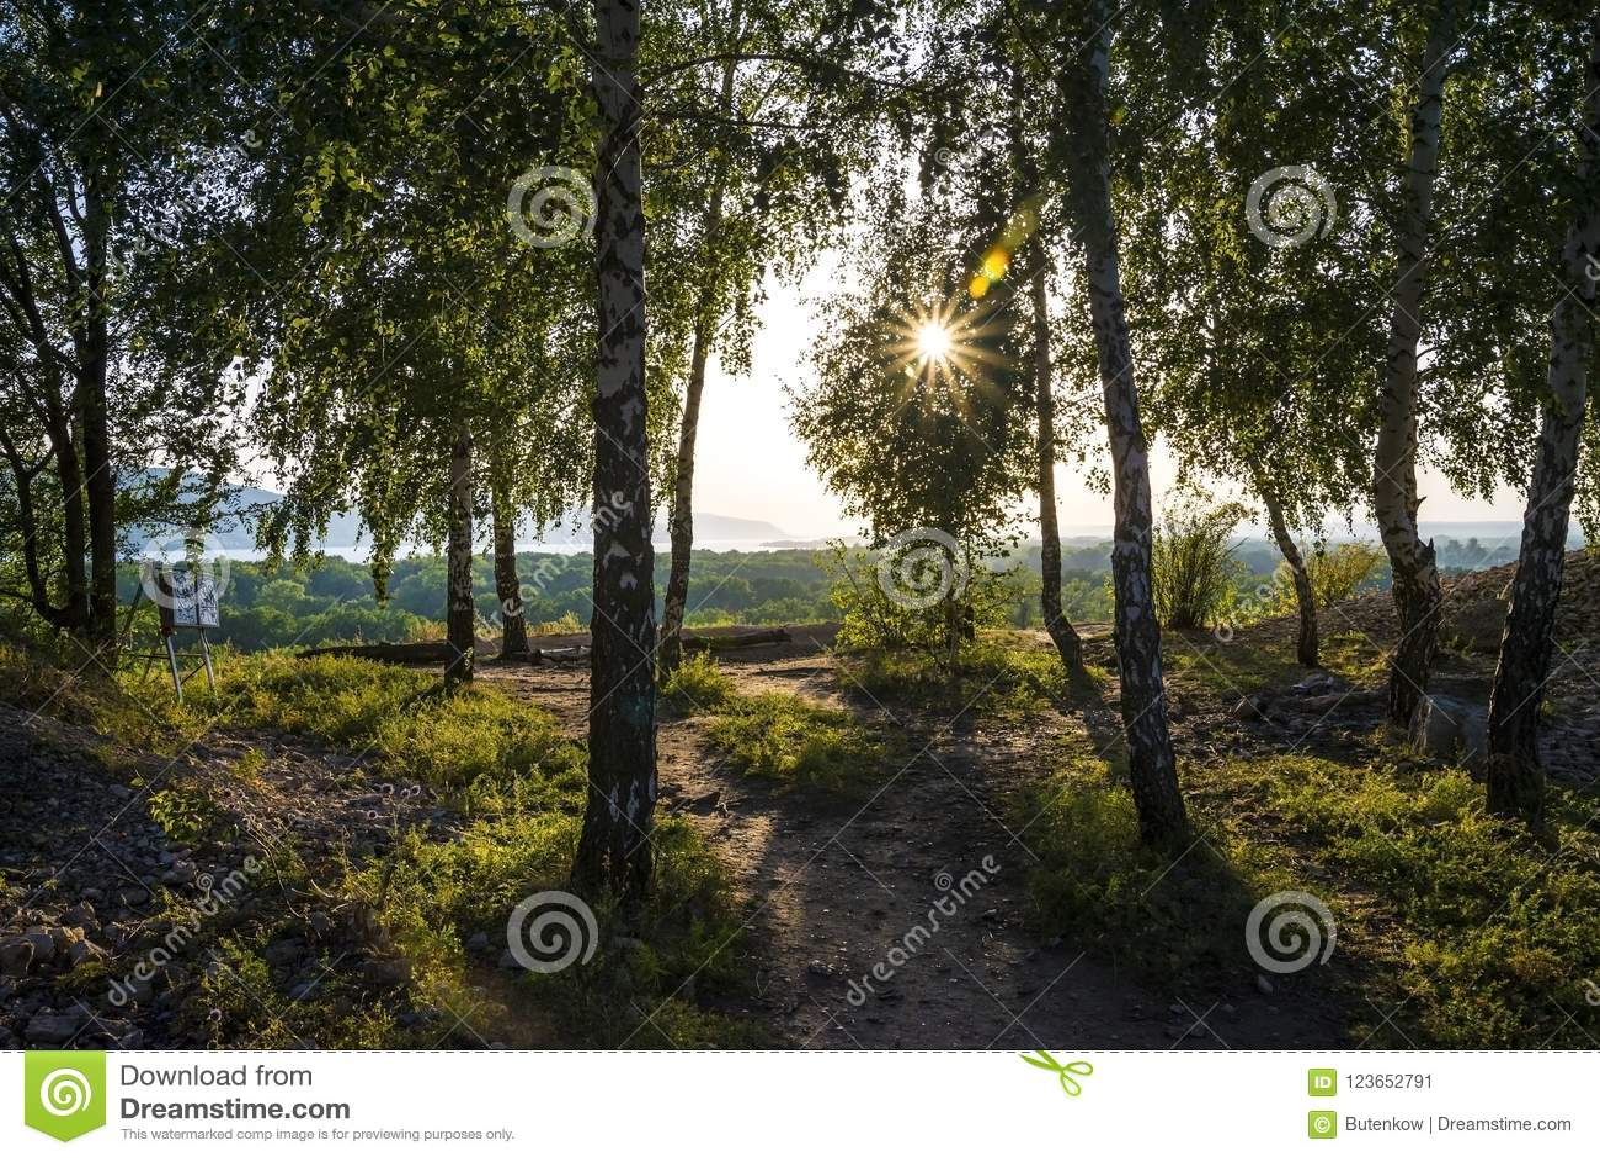 Tsarev Kurgan, Samara: description, location and interesting facts 70